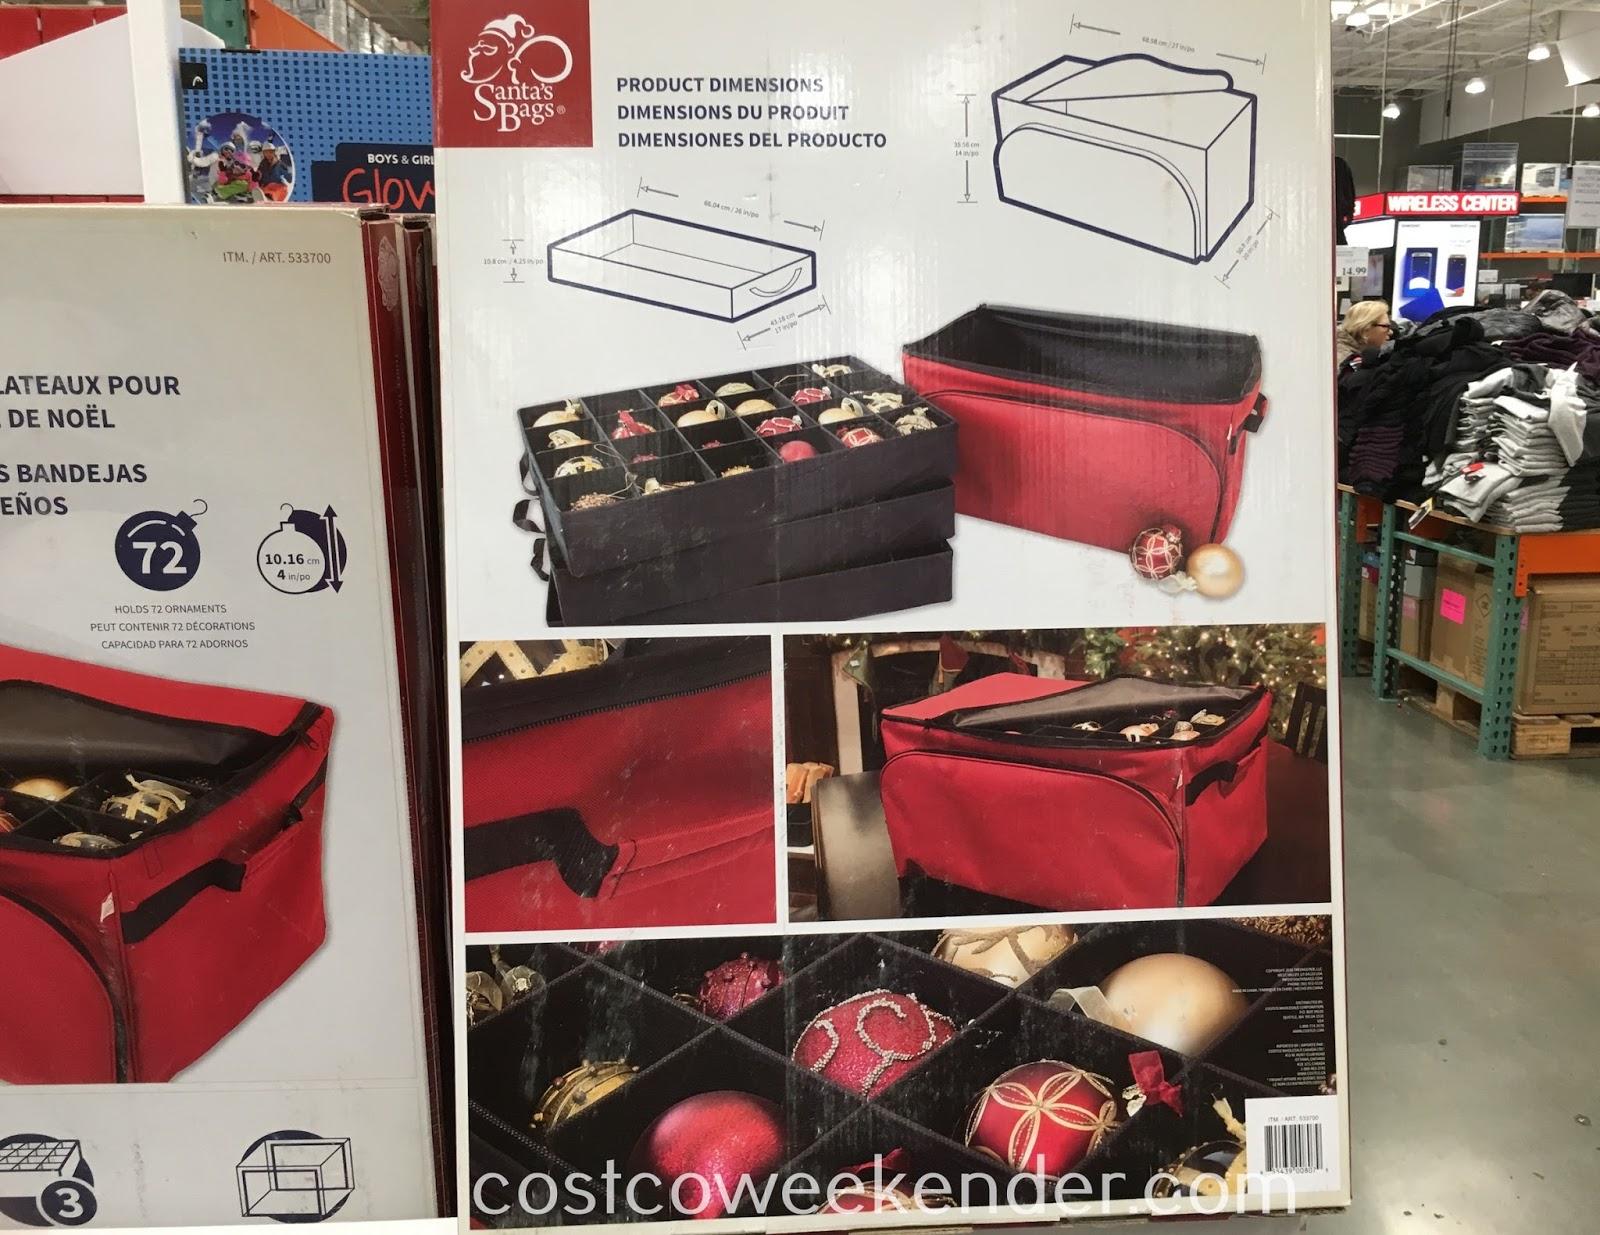 Santa S Bags Three Tray Ornament Keeper Costco Weekender